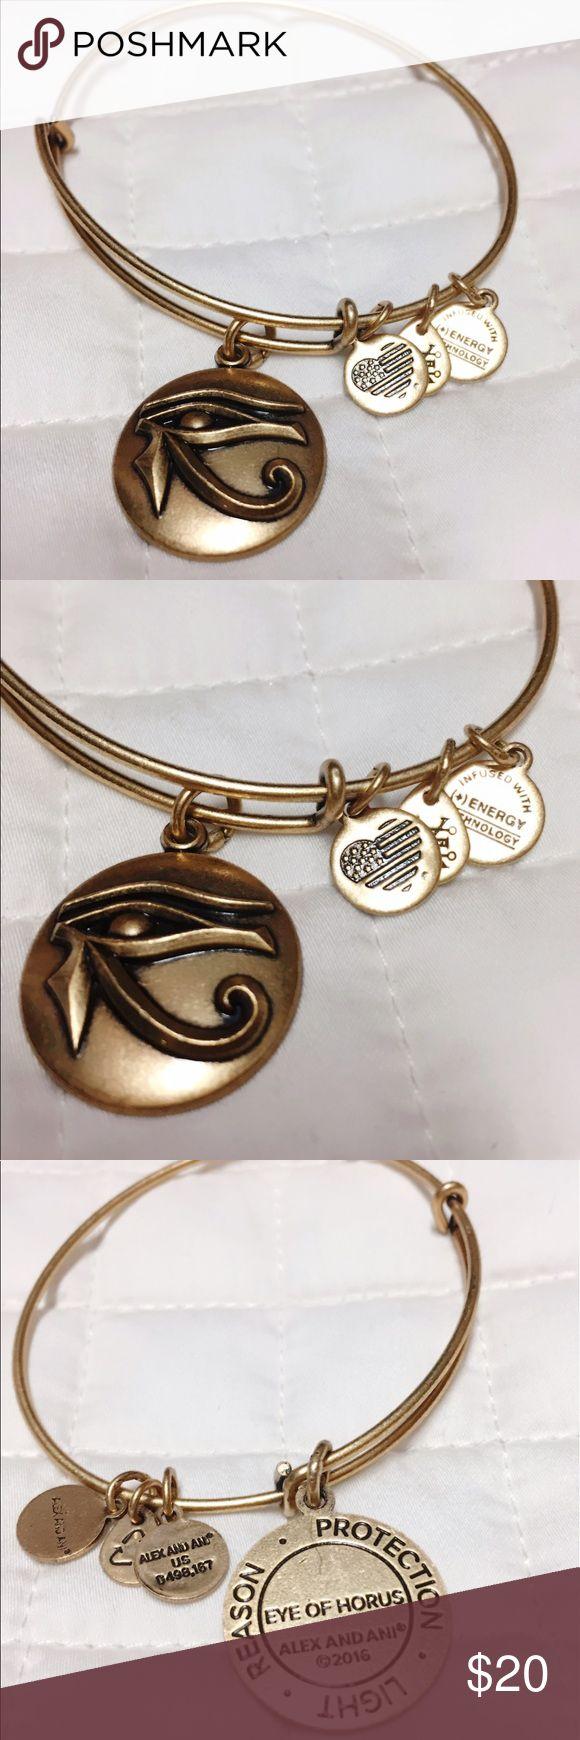 Alex & Ani Eye of Horus Bangle Rafaelian gold finish. In perfect condition, NWOT Alex & Ani Jewelry Bracelets